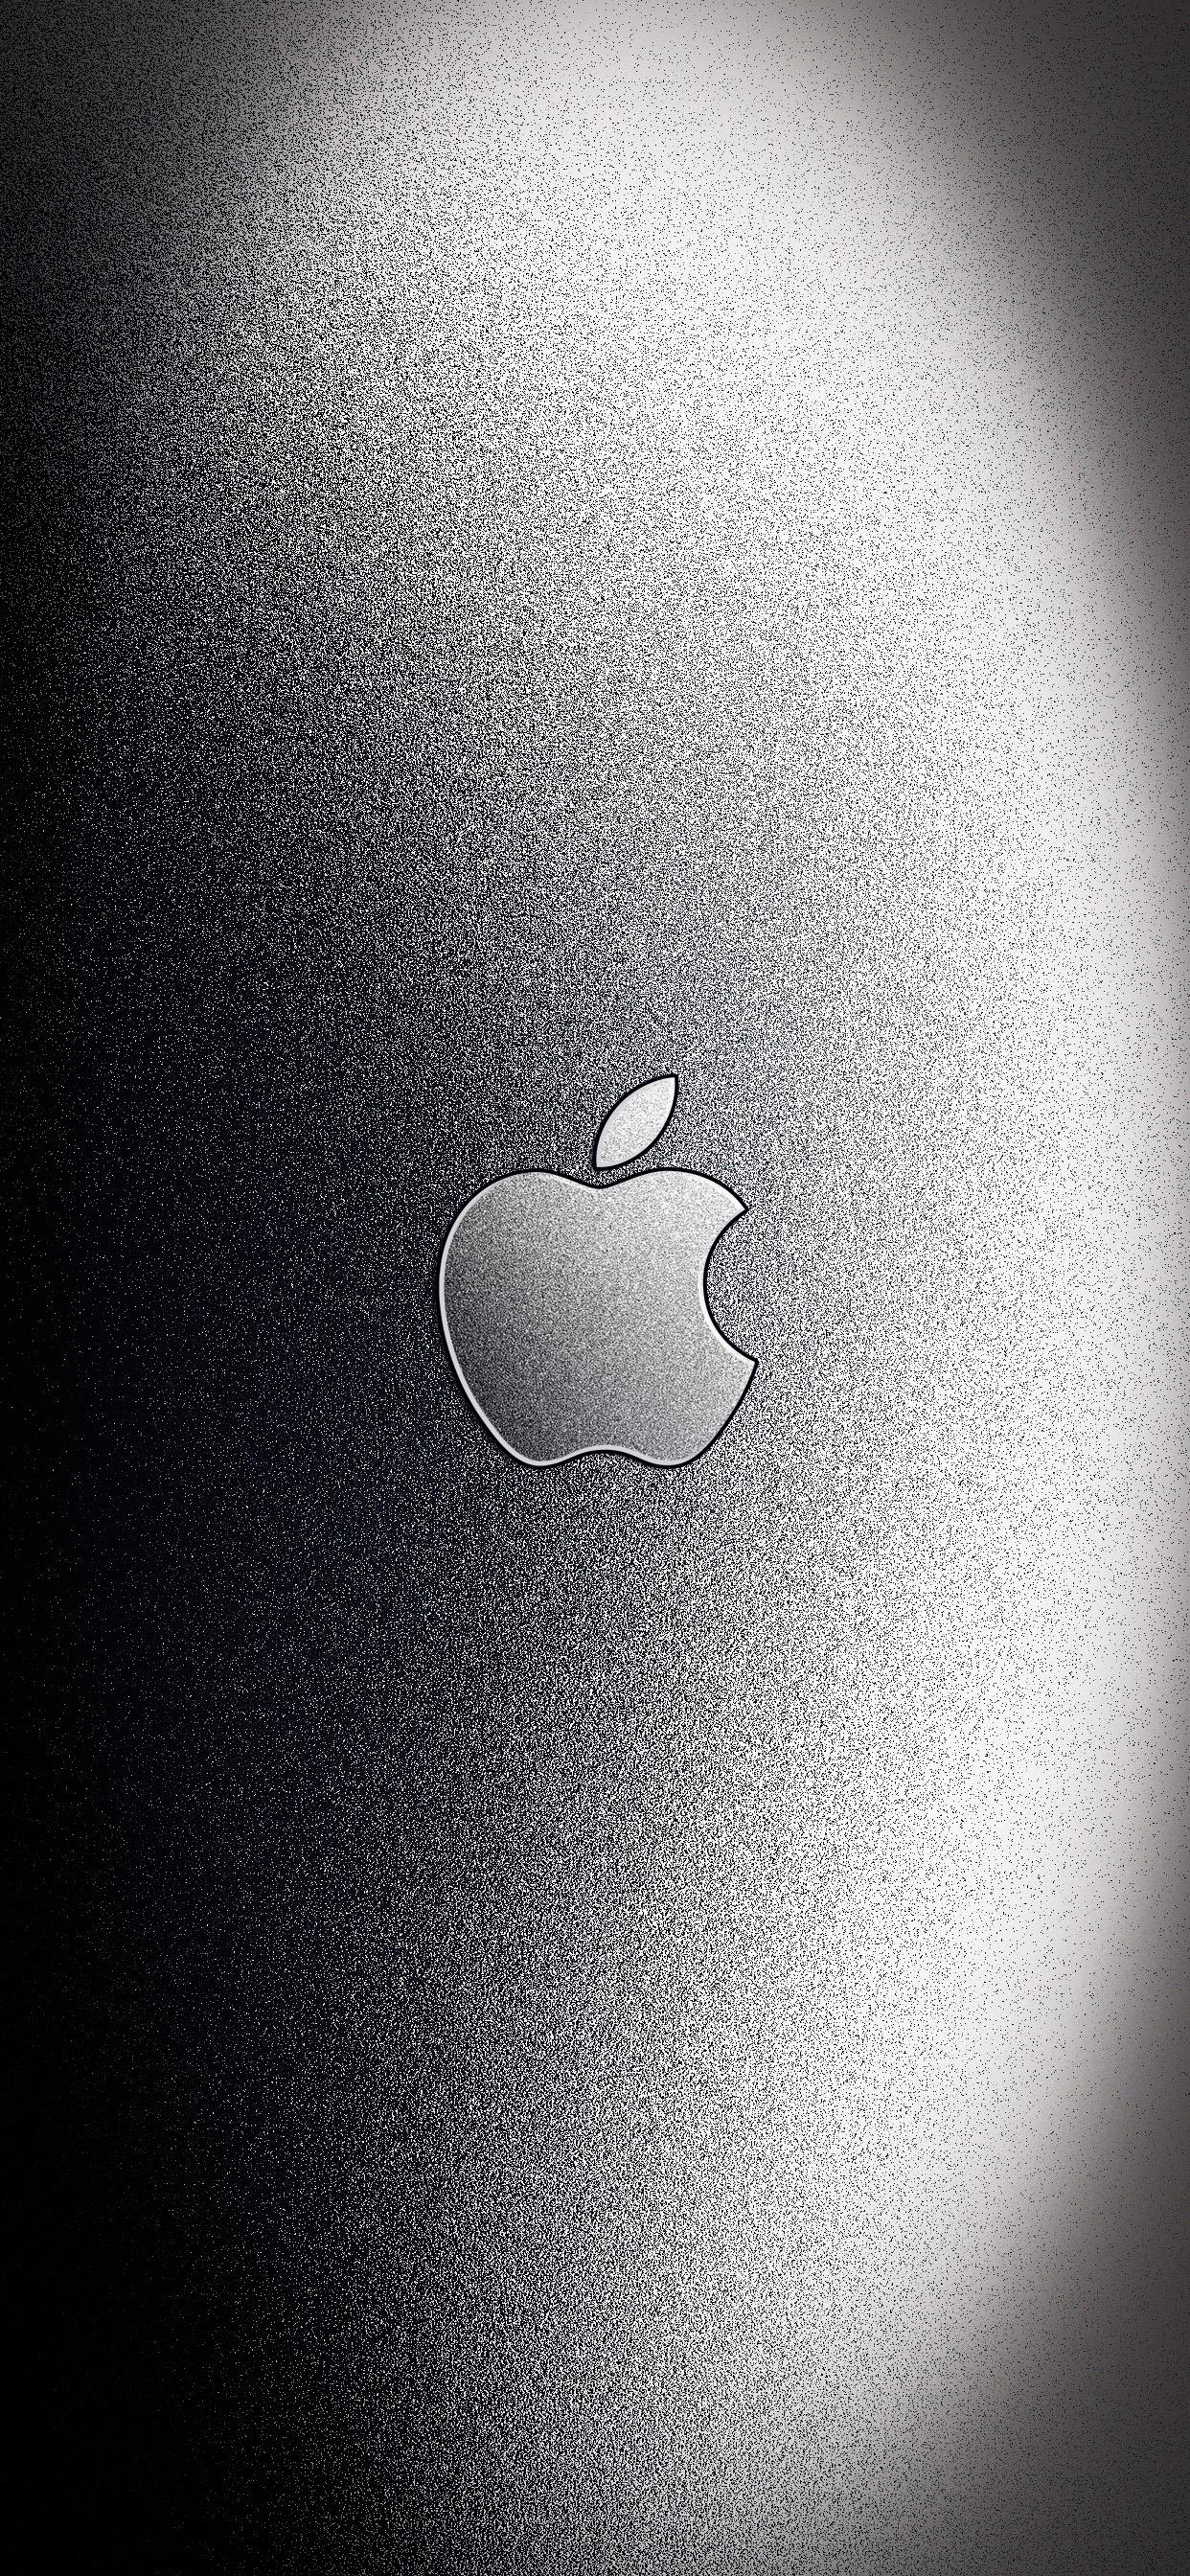 iPhone wallpaper texture logo apple grey Fonds d'écran iPhone du 21/01/2019